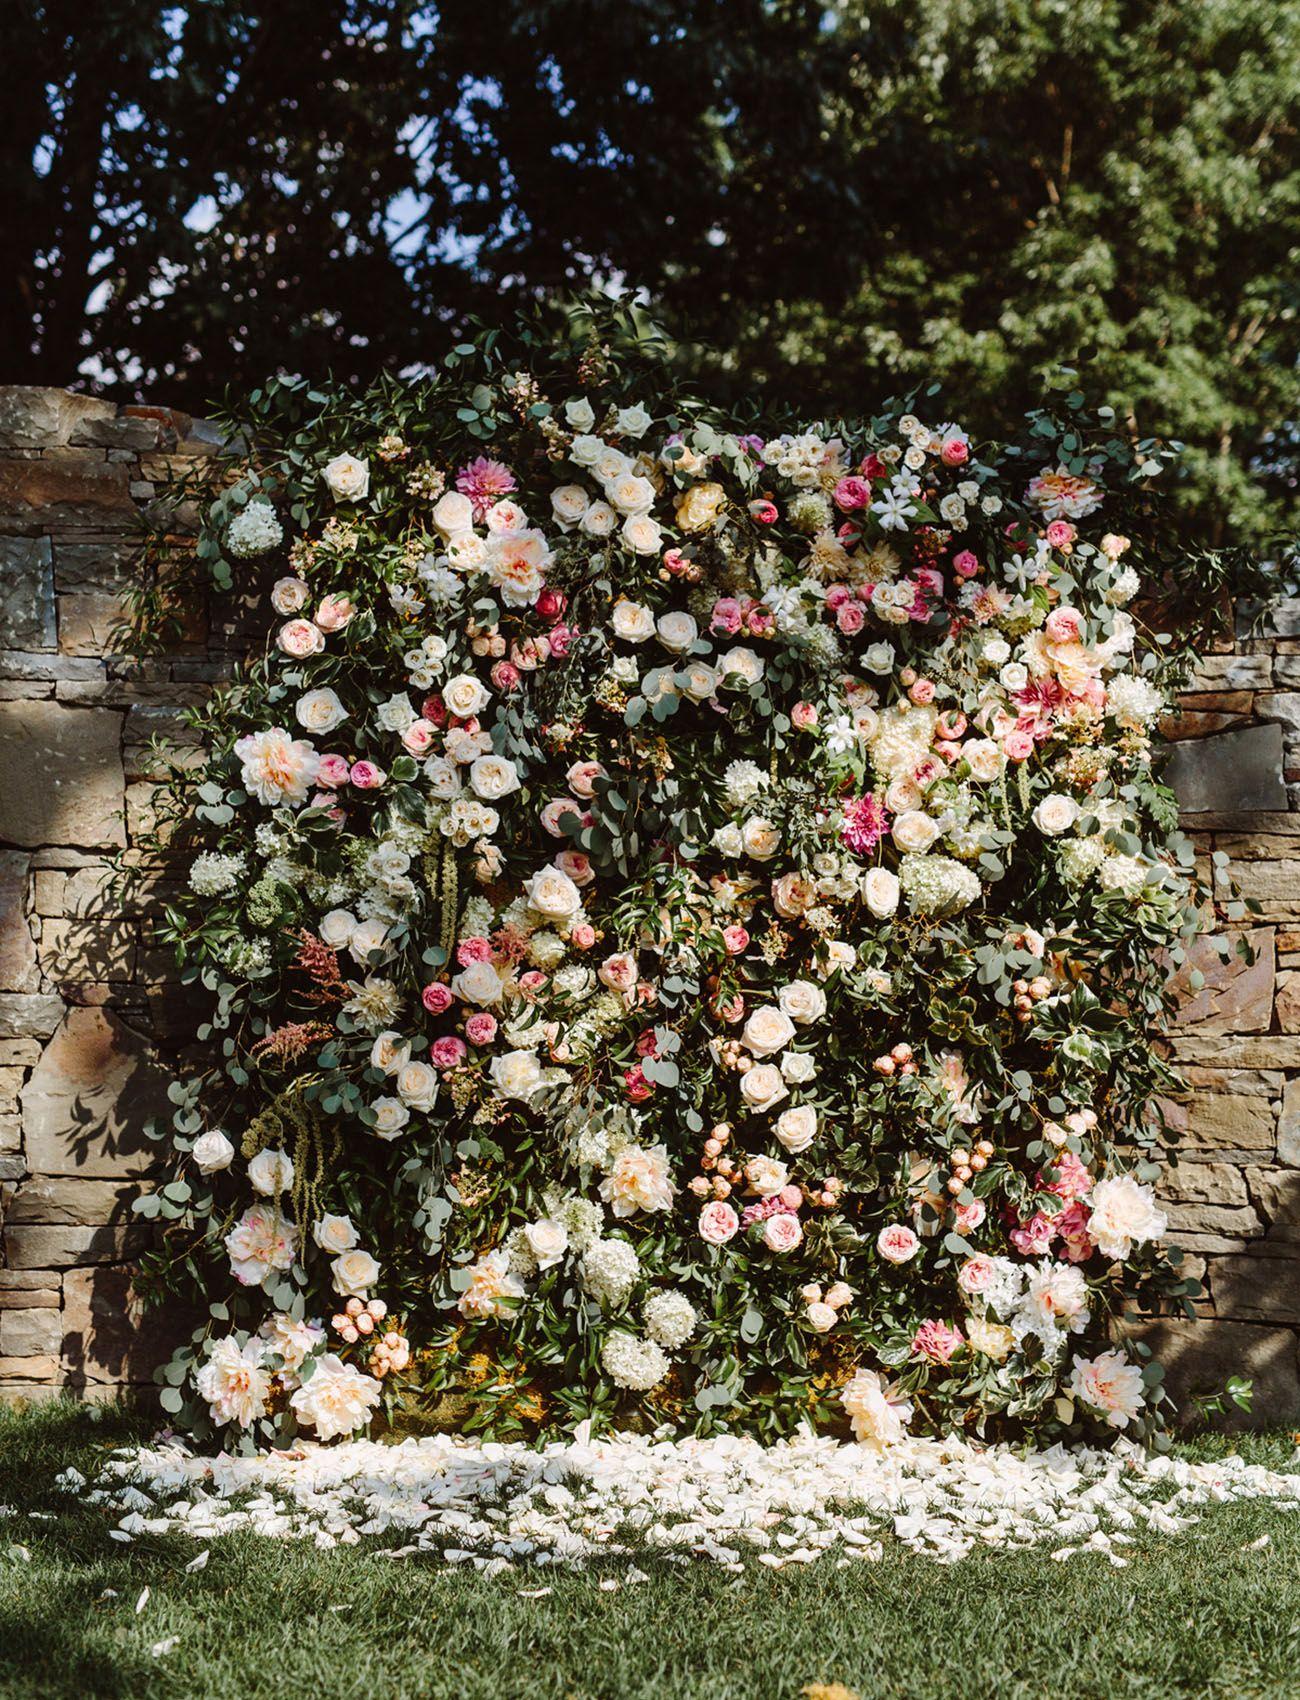 Our Favorite Wedding Decor + Details from 2017 | WEDDING DETAILS ...